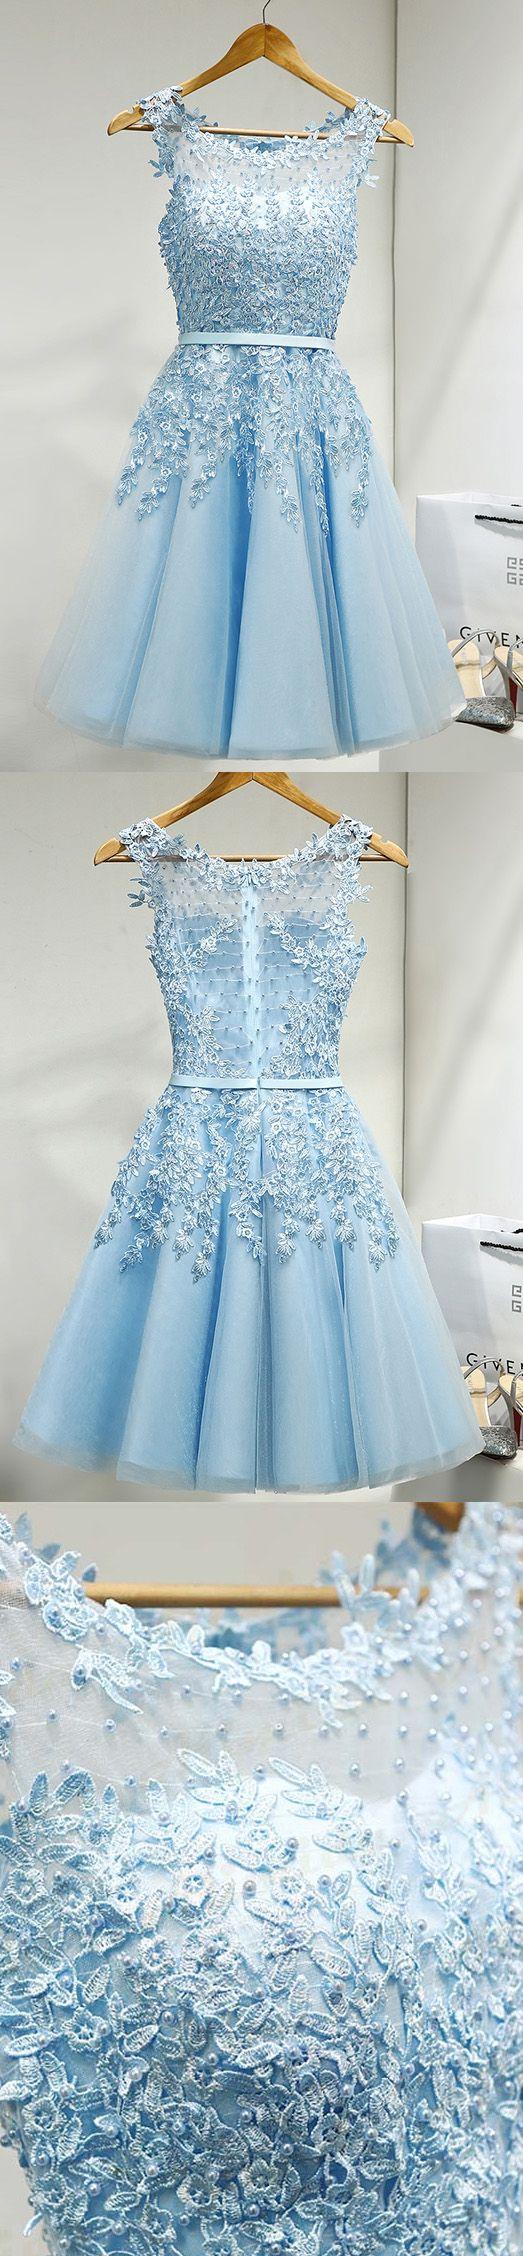 Outlet Distinct Short Light Blue Prom Homecoming Dresses With Mini Zipper Beaded/Beading Dresses